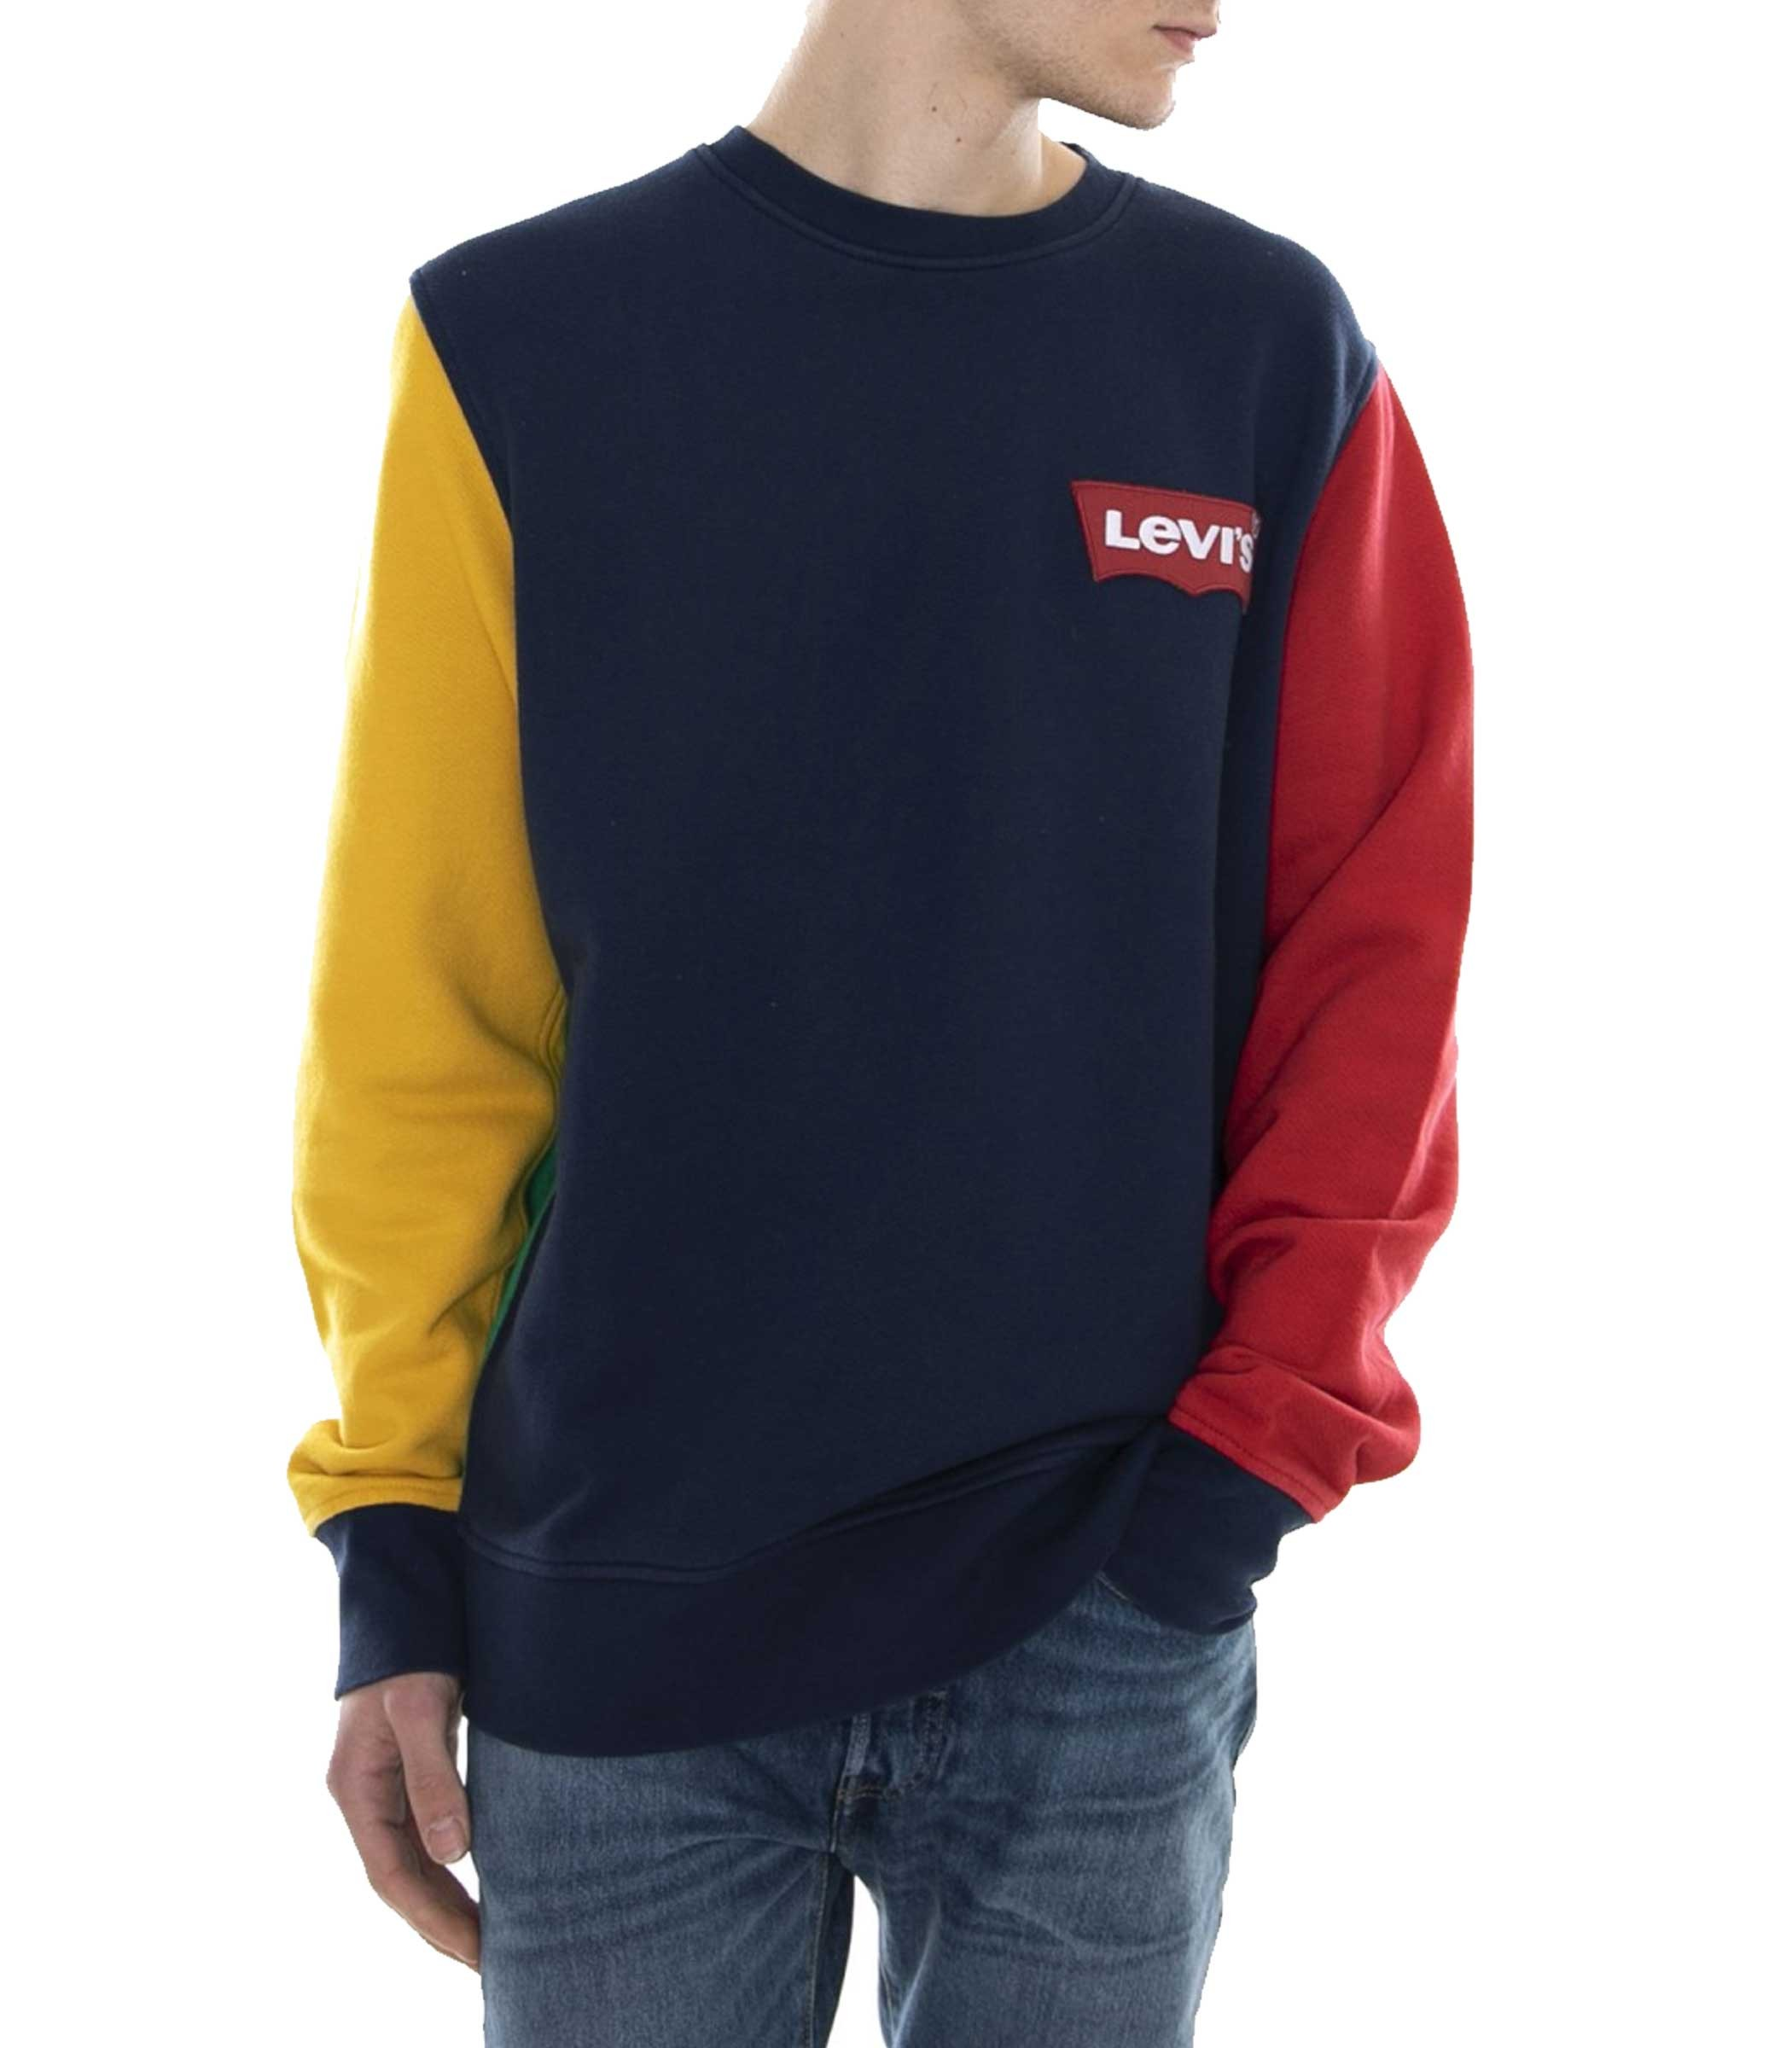 Felpa Levi s Modern Logo Crewneck Sweatshirt da uomo rif. 56606-0004 2194fda5e9b